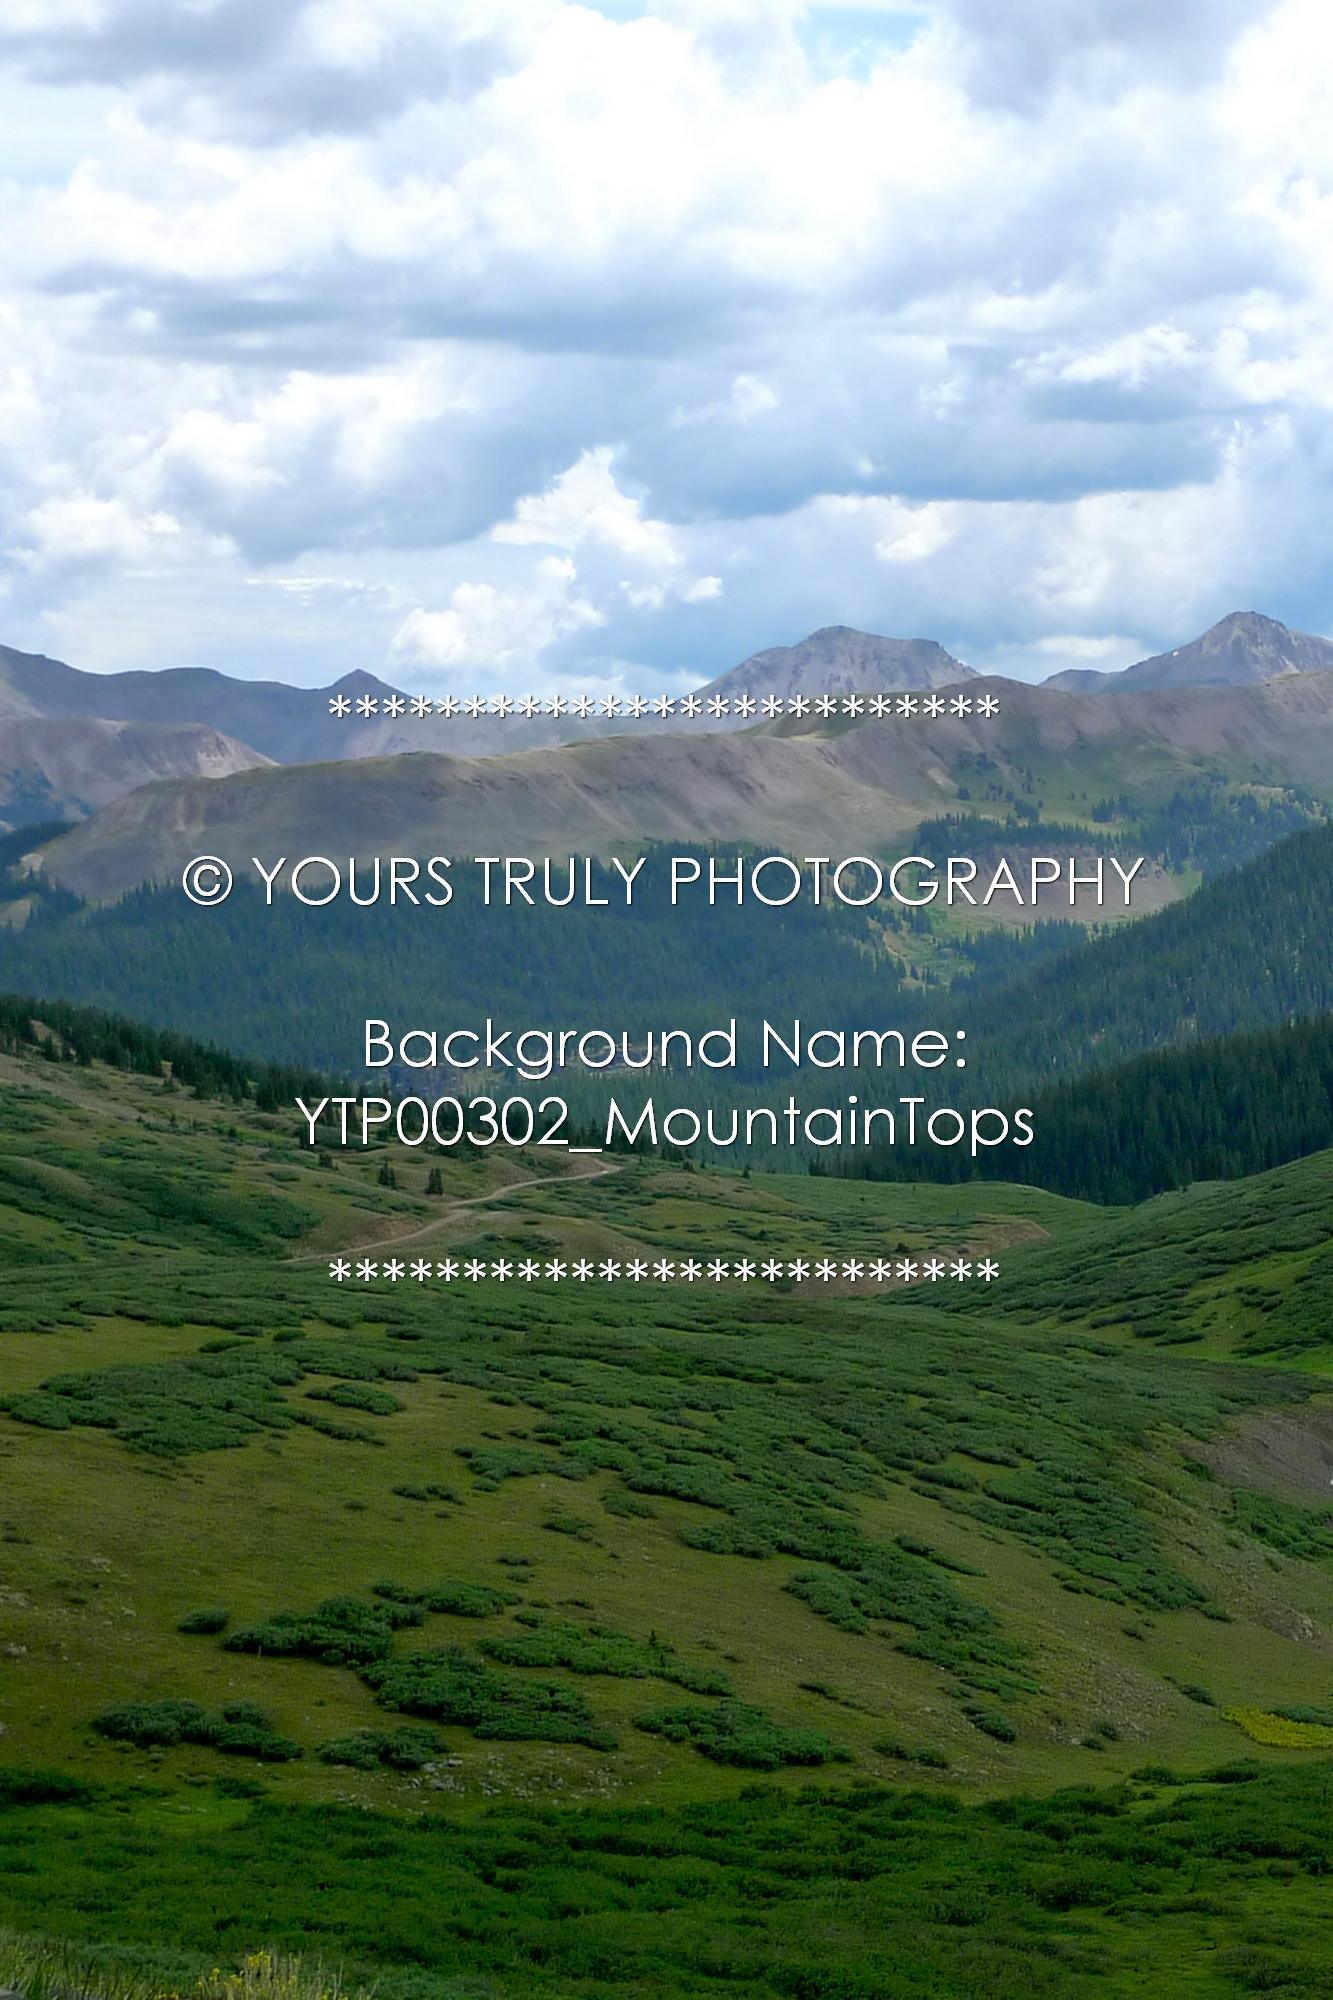 YTP00302_MountainTops.jpg